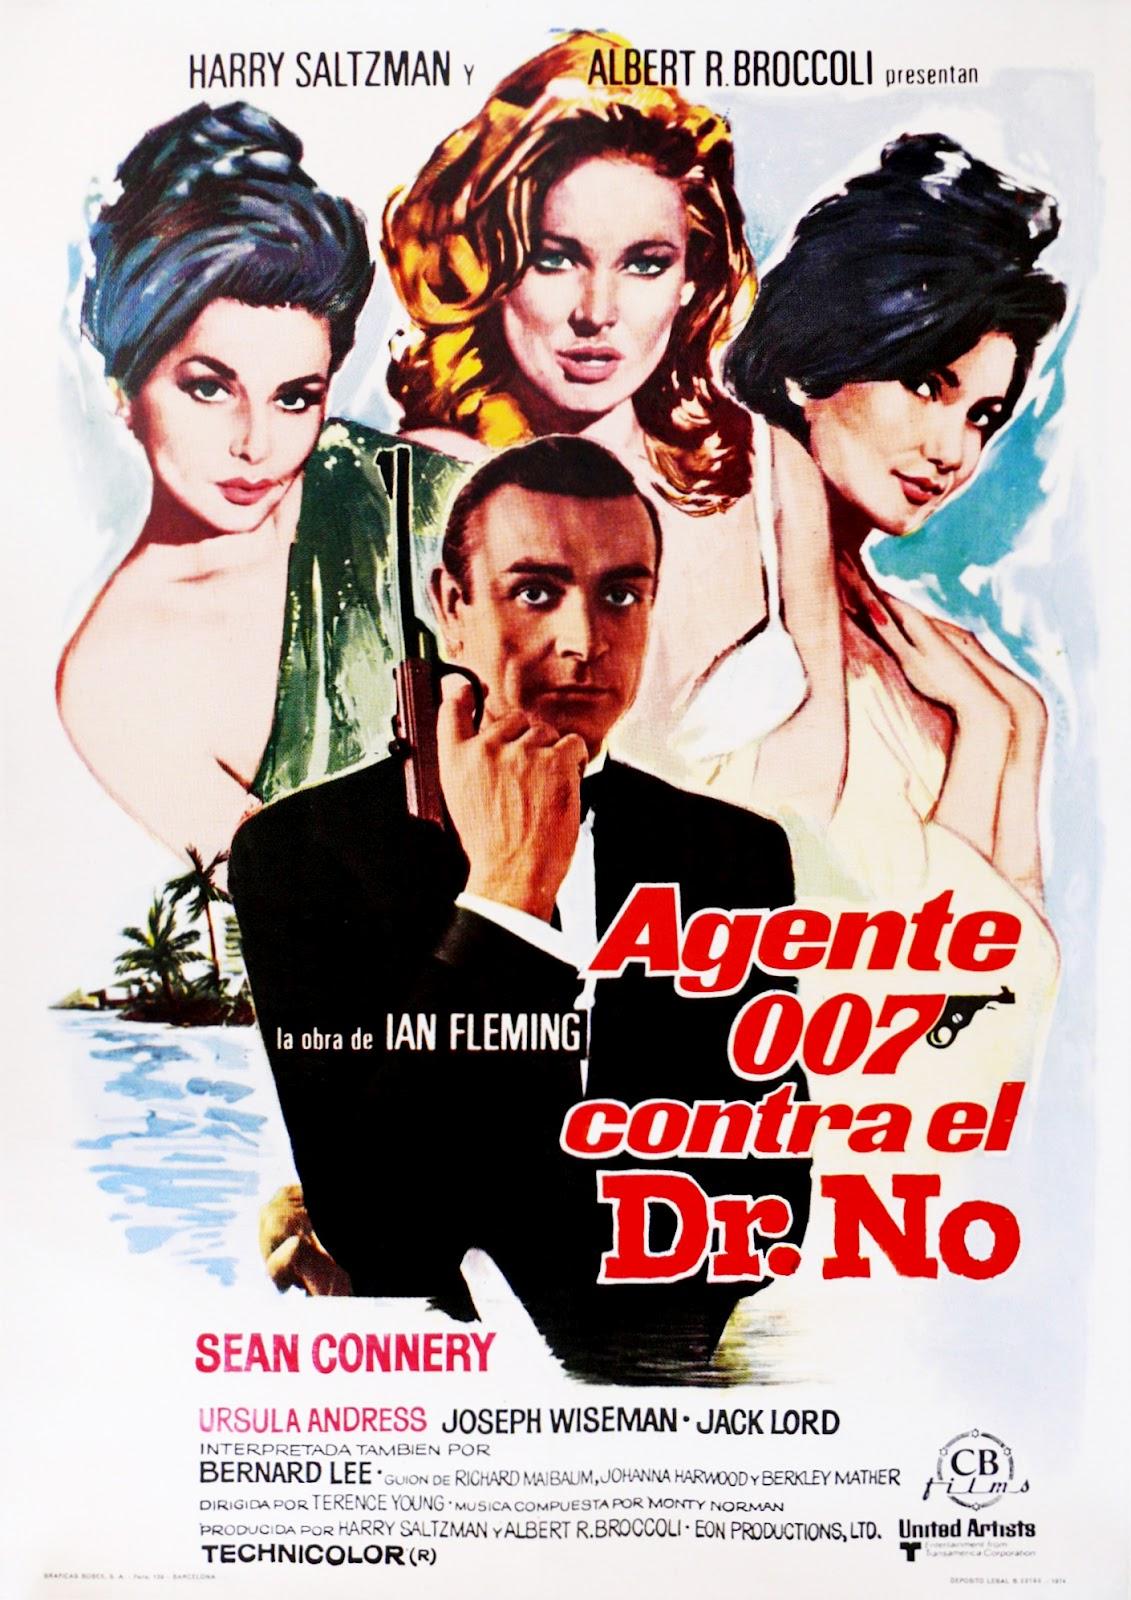 http://3.bp.blogspot.com/-qzv811zGXm4/UHNOE9rUMEI/AAAAAAAAB18/Frp3gYZOOJw/s1600/Dr+No+(1962)+Spain.jpg